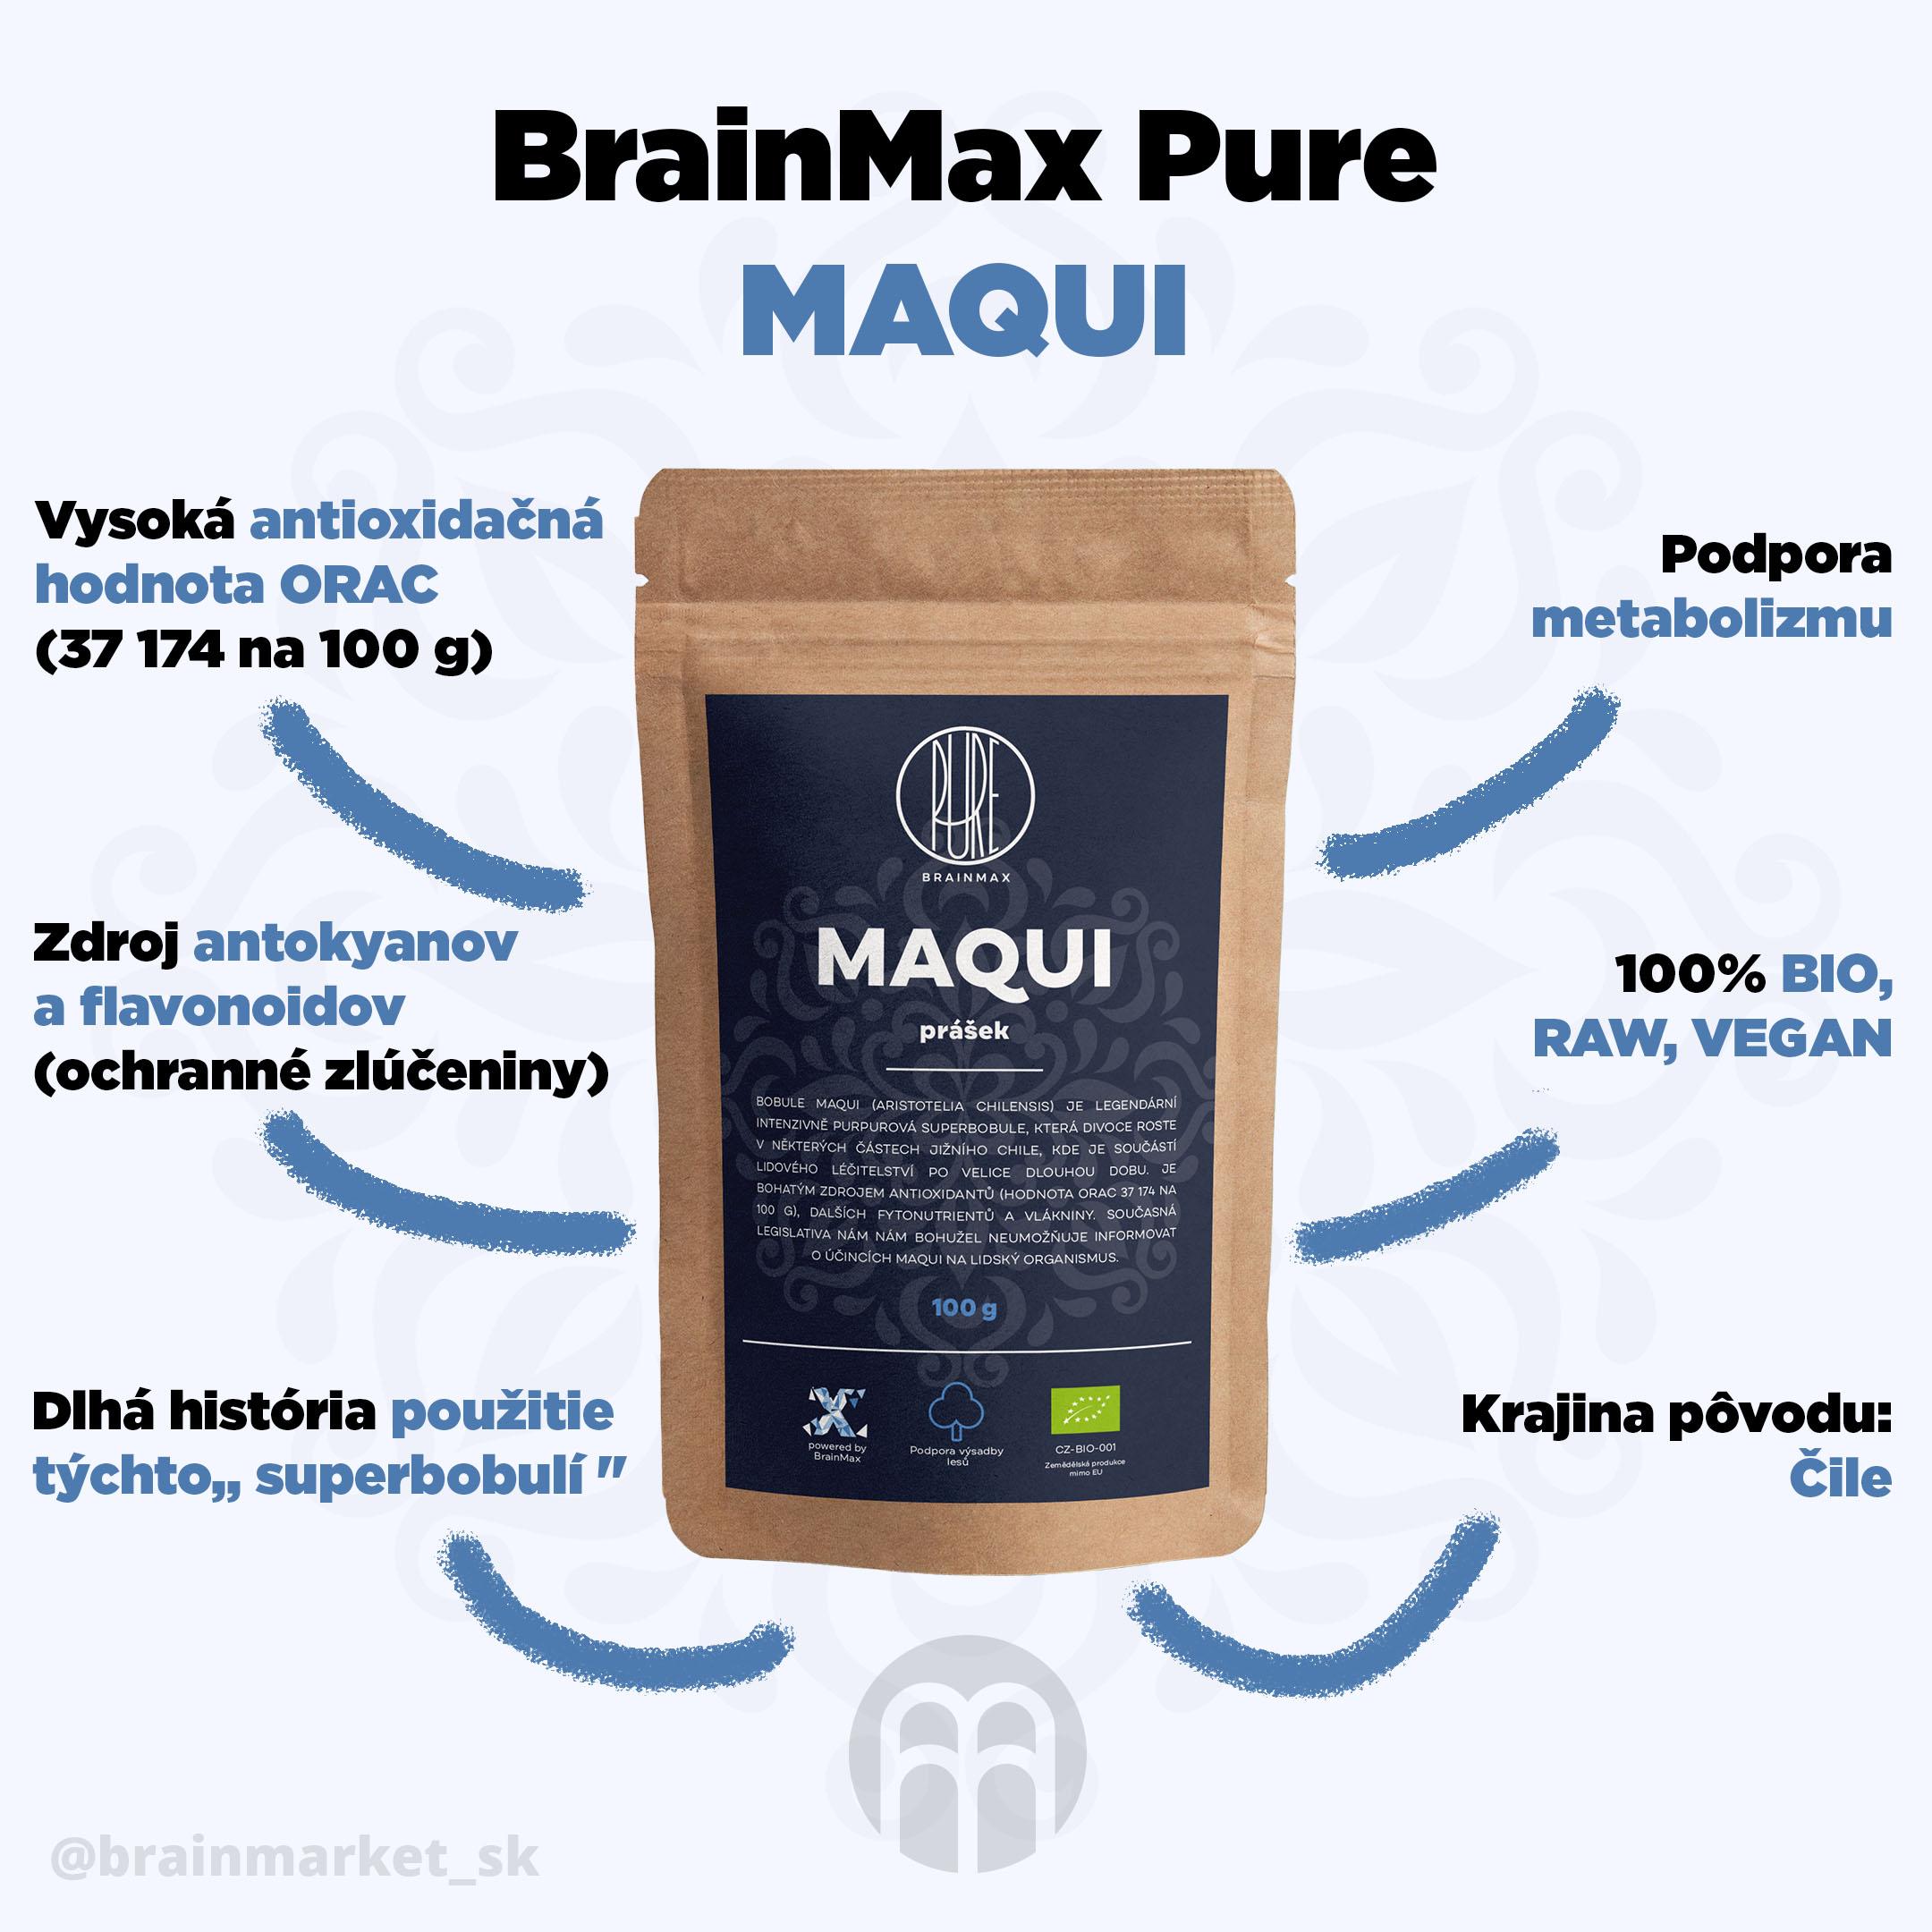 maqui_infografika_brainmarket_sk